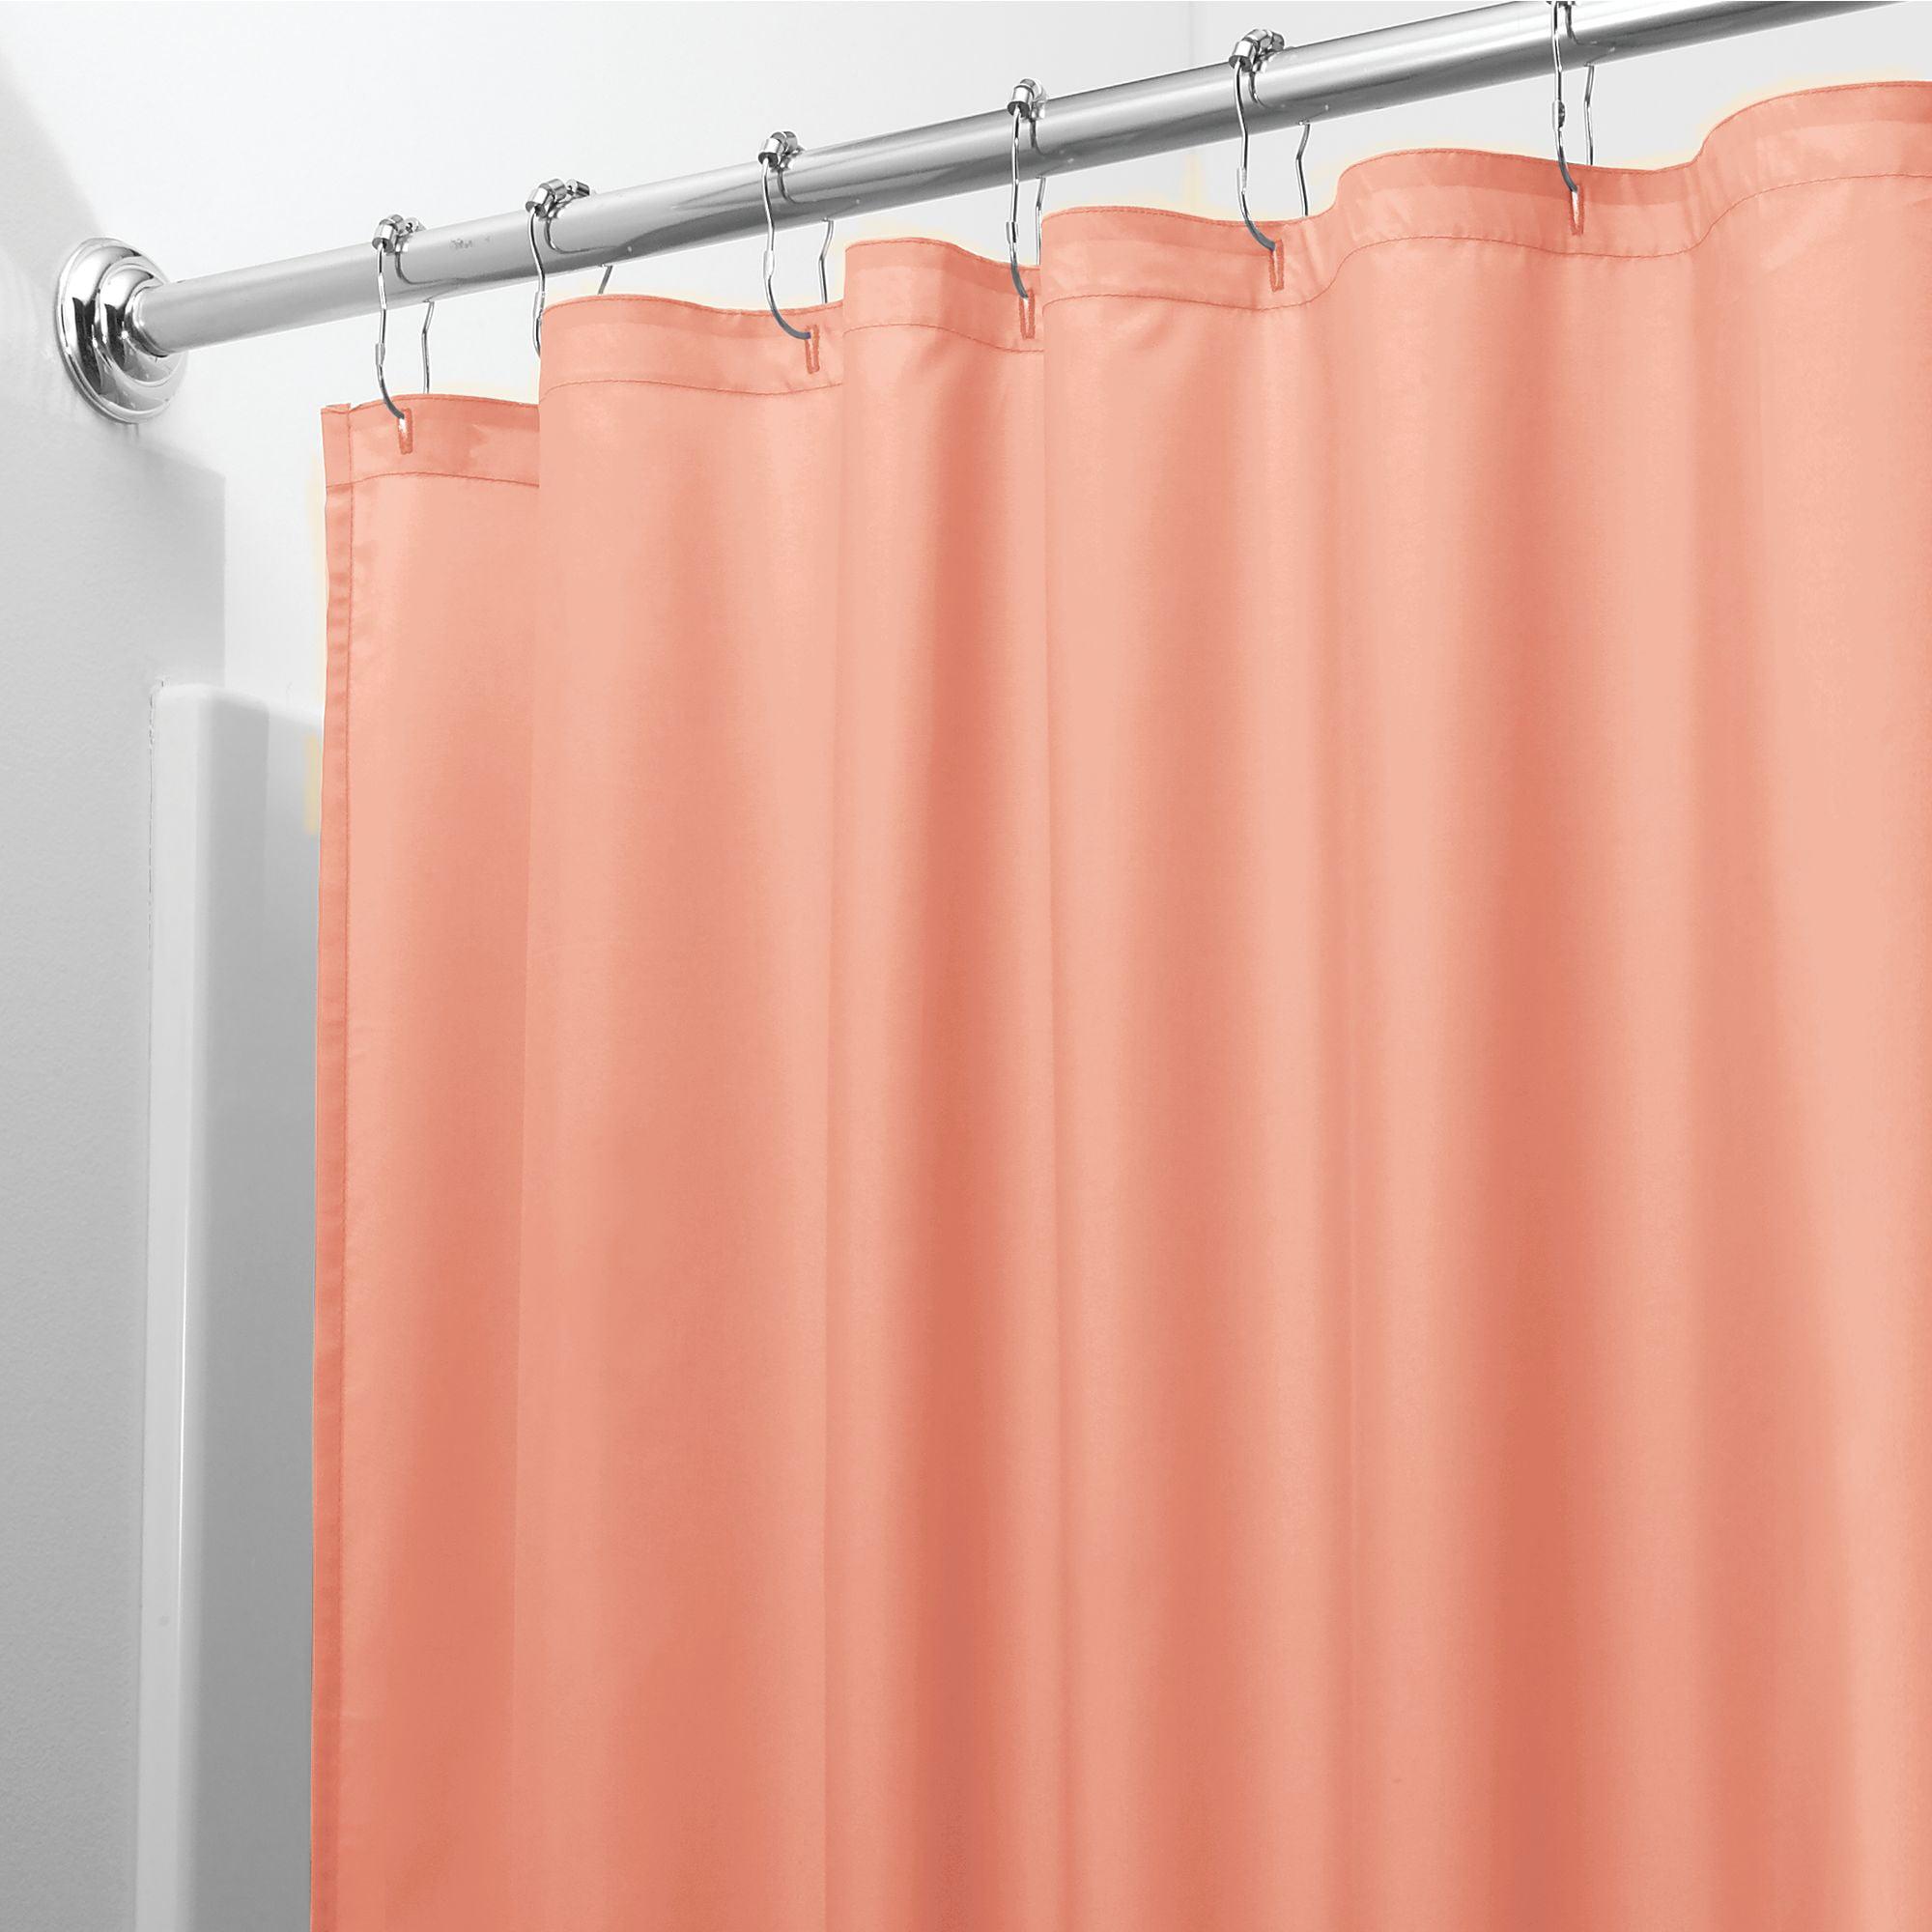 Interdesign Waterproof Fabric Shower Curtain Liner Standard